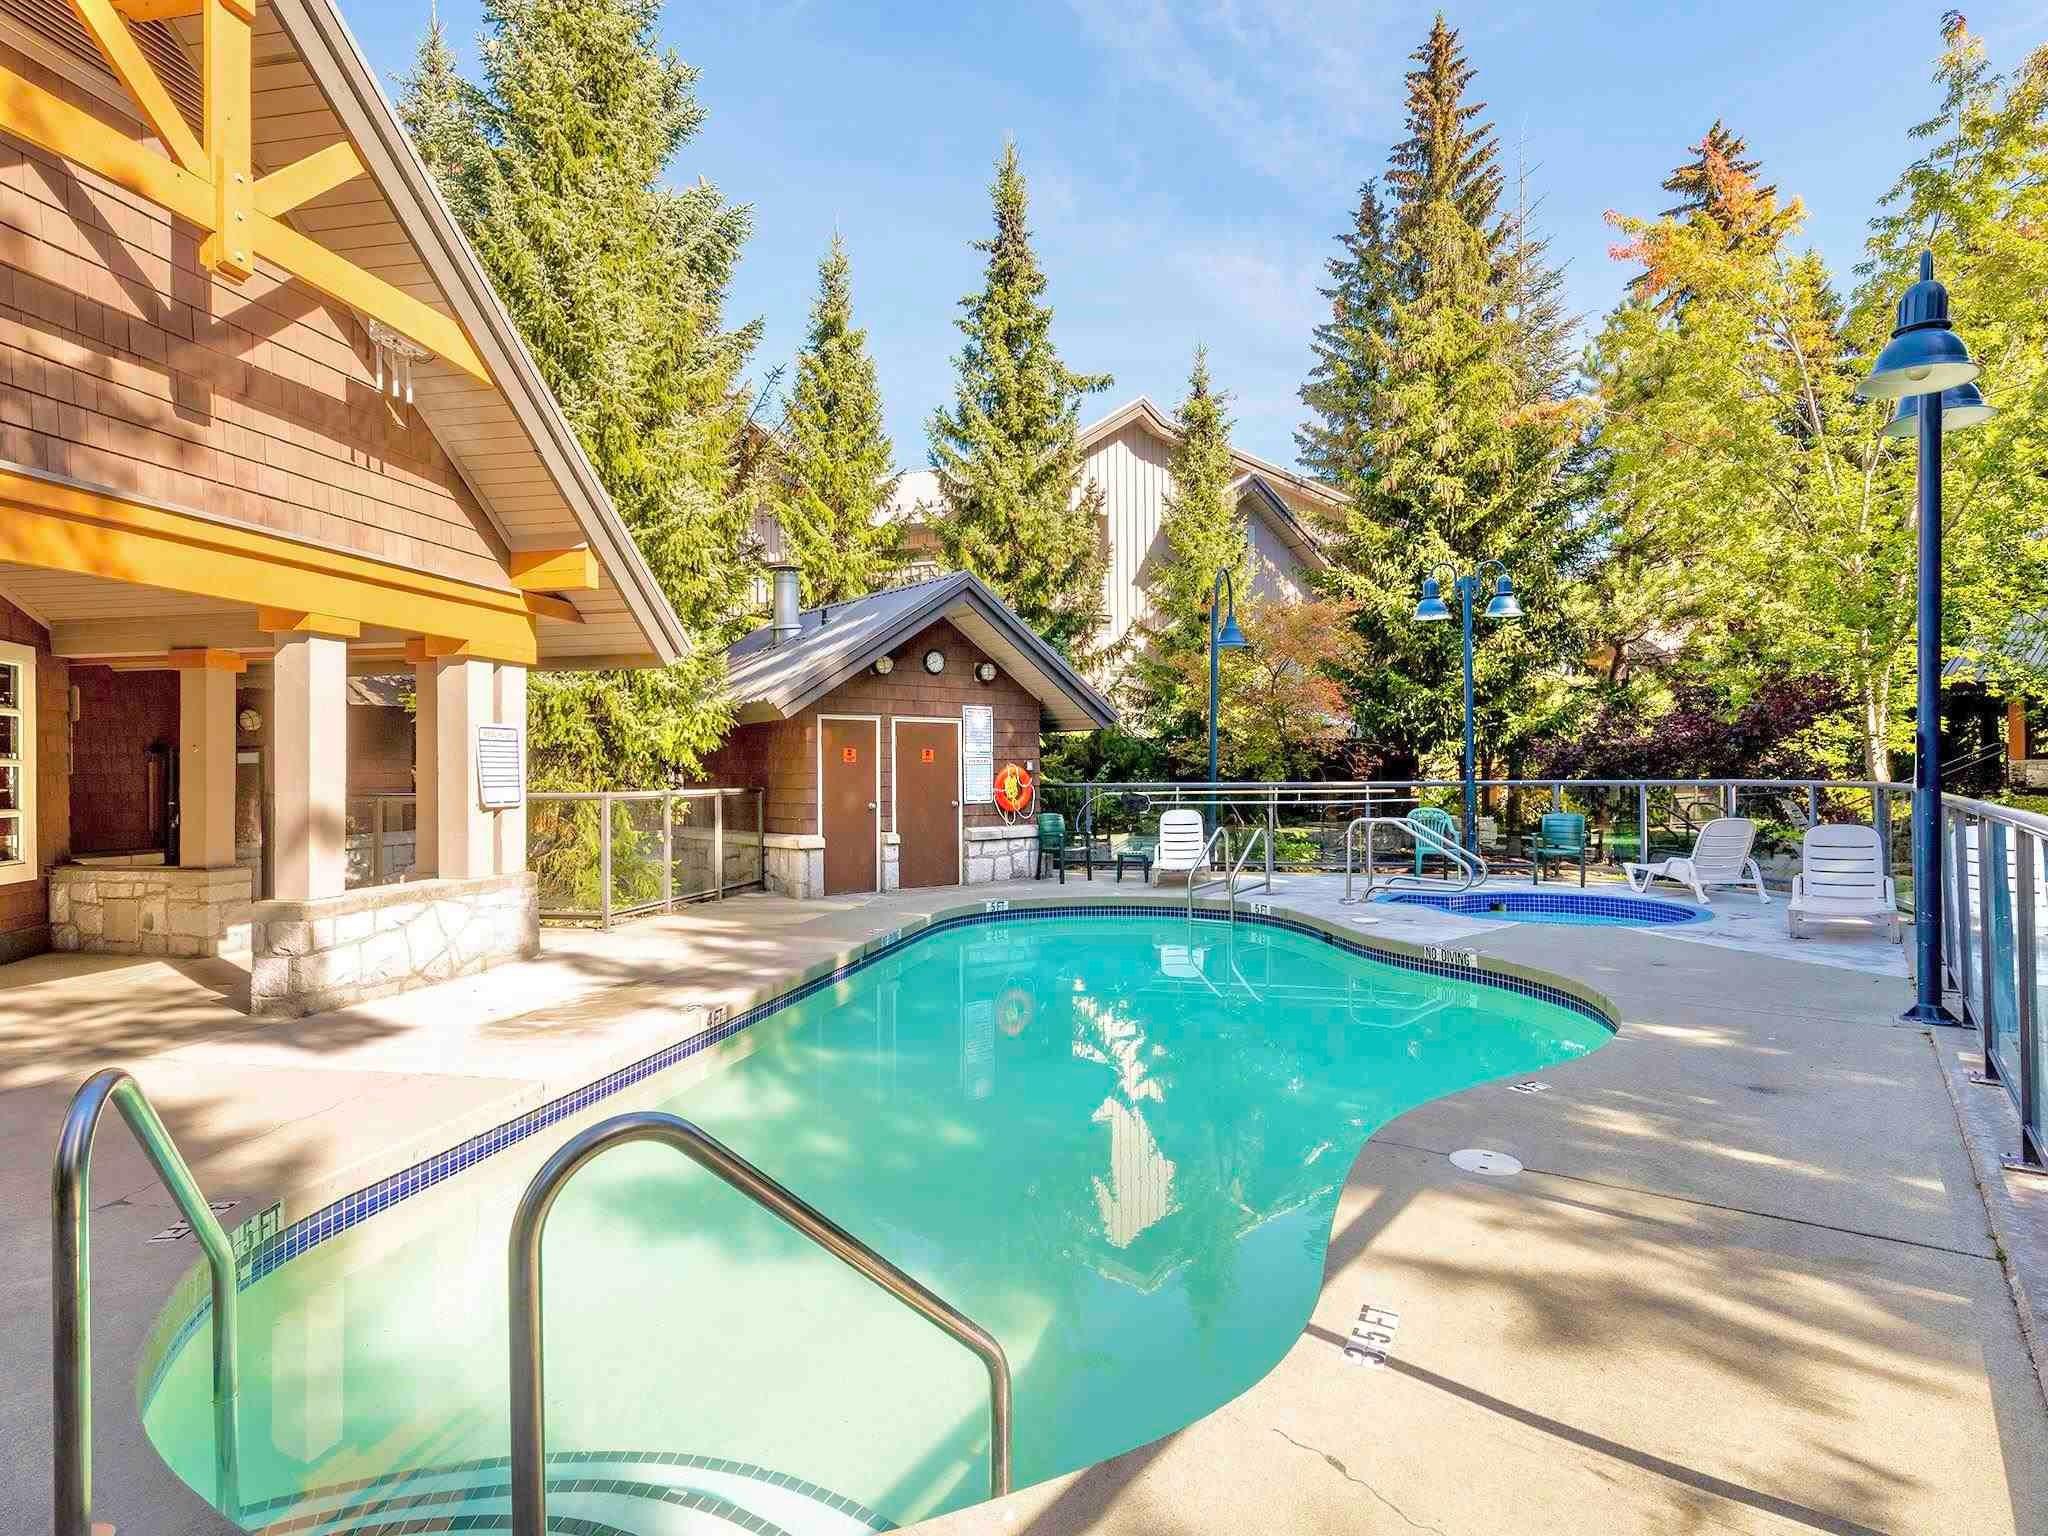 73 4388 NORTHLANDS BOULEVARD - Whistler Village Townhouse for sale, 2 Bedrooms (R2580863) - #16